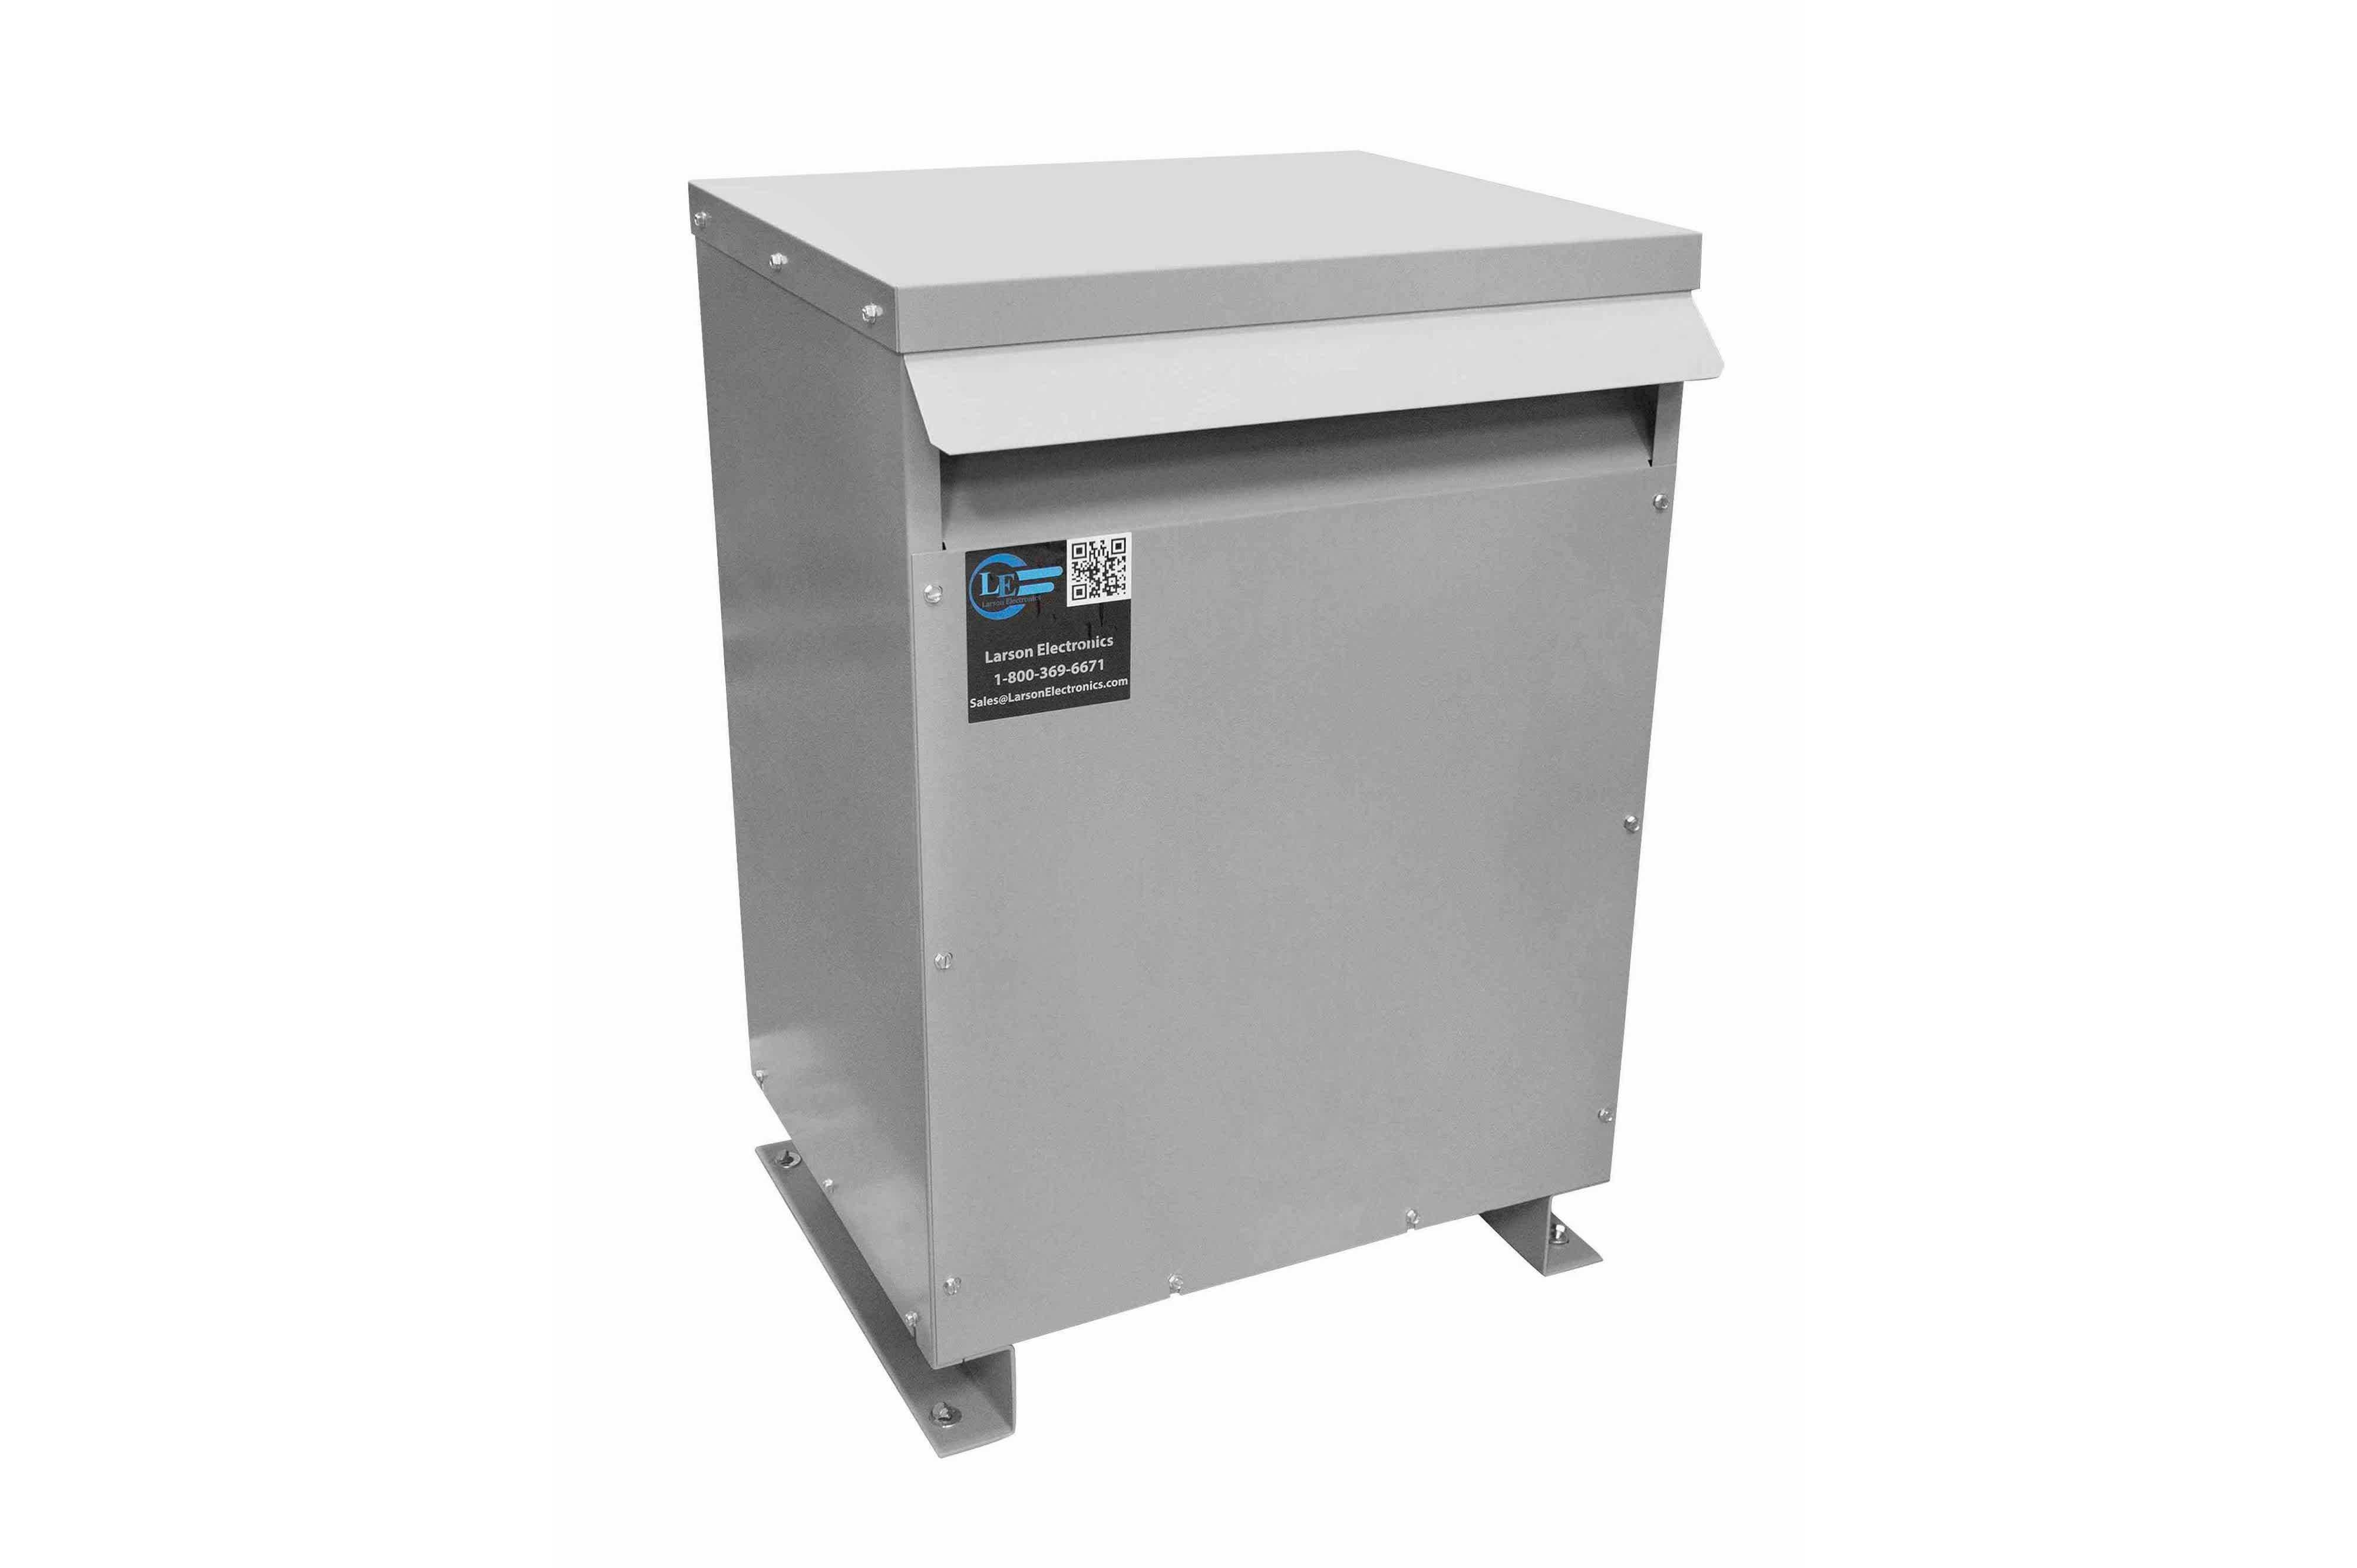 750 kVA 3PH Isolation Transformer, 240V Wye Primary, 600V Delta Secondary, N3R, Ventilated, 60 Hz